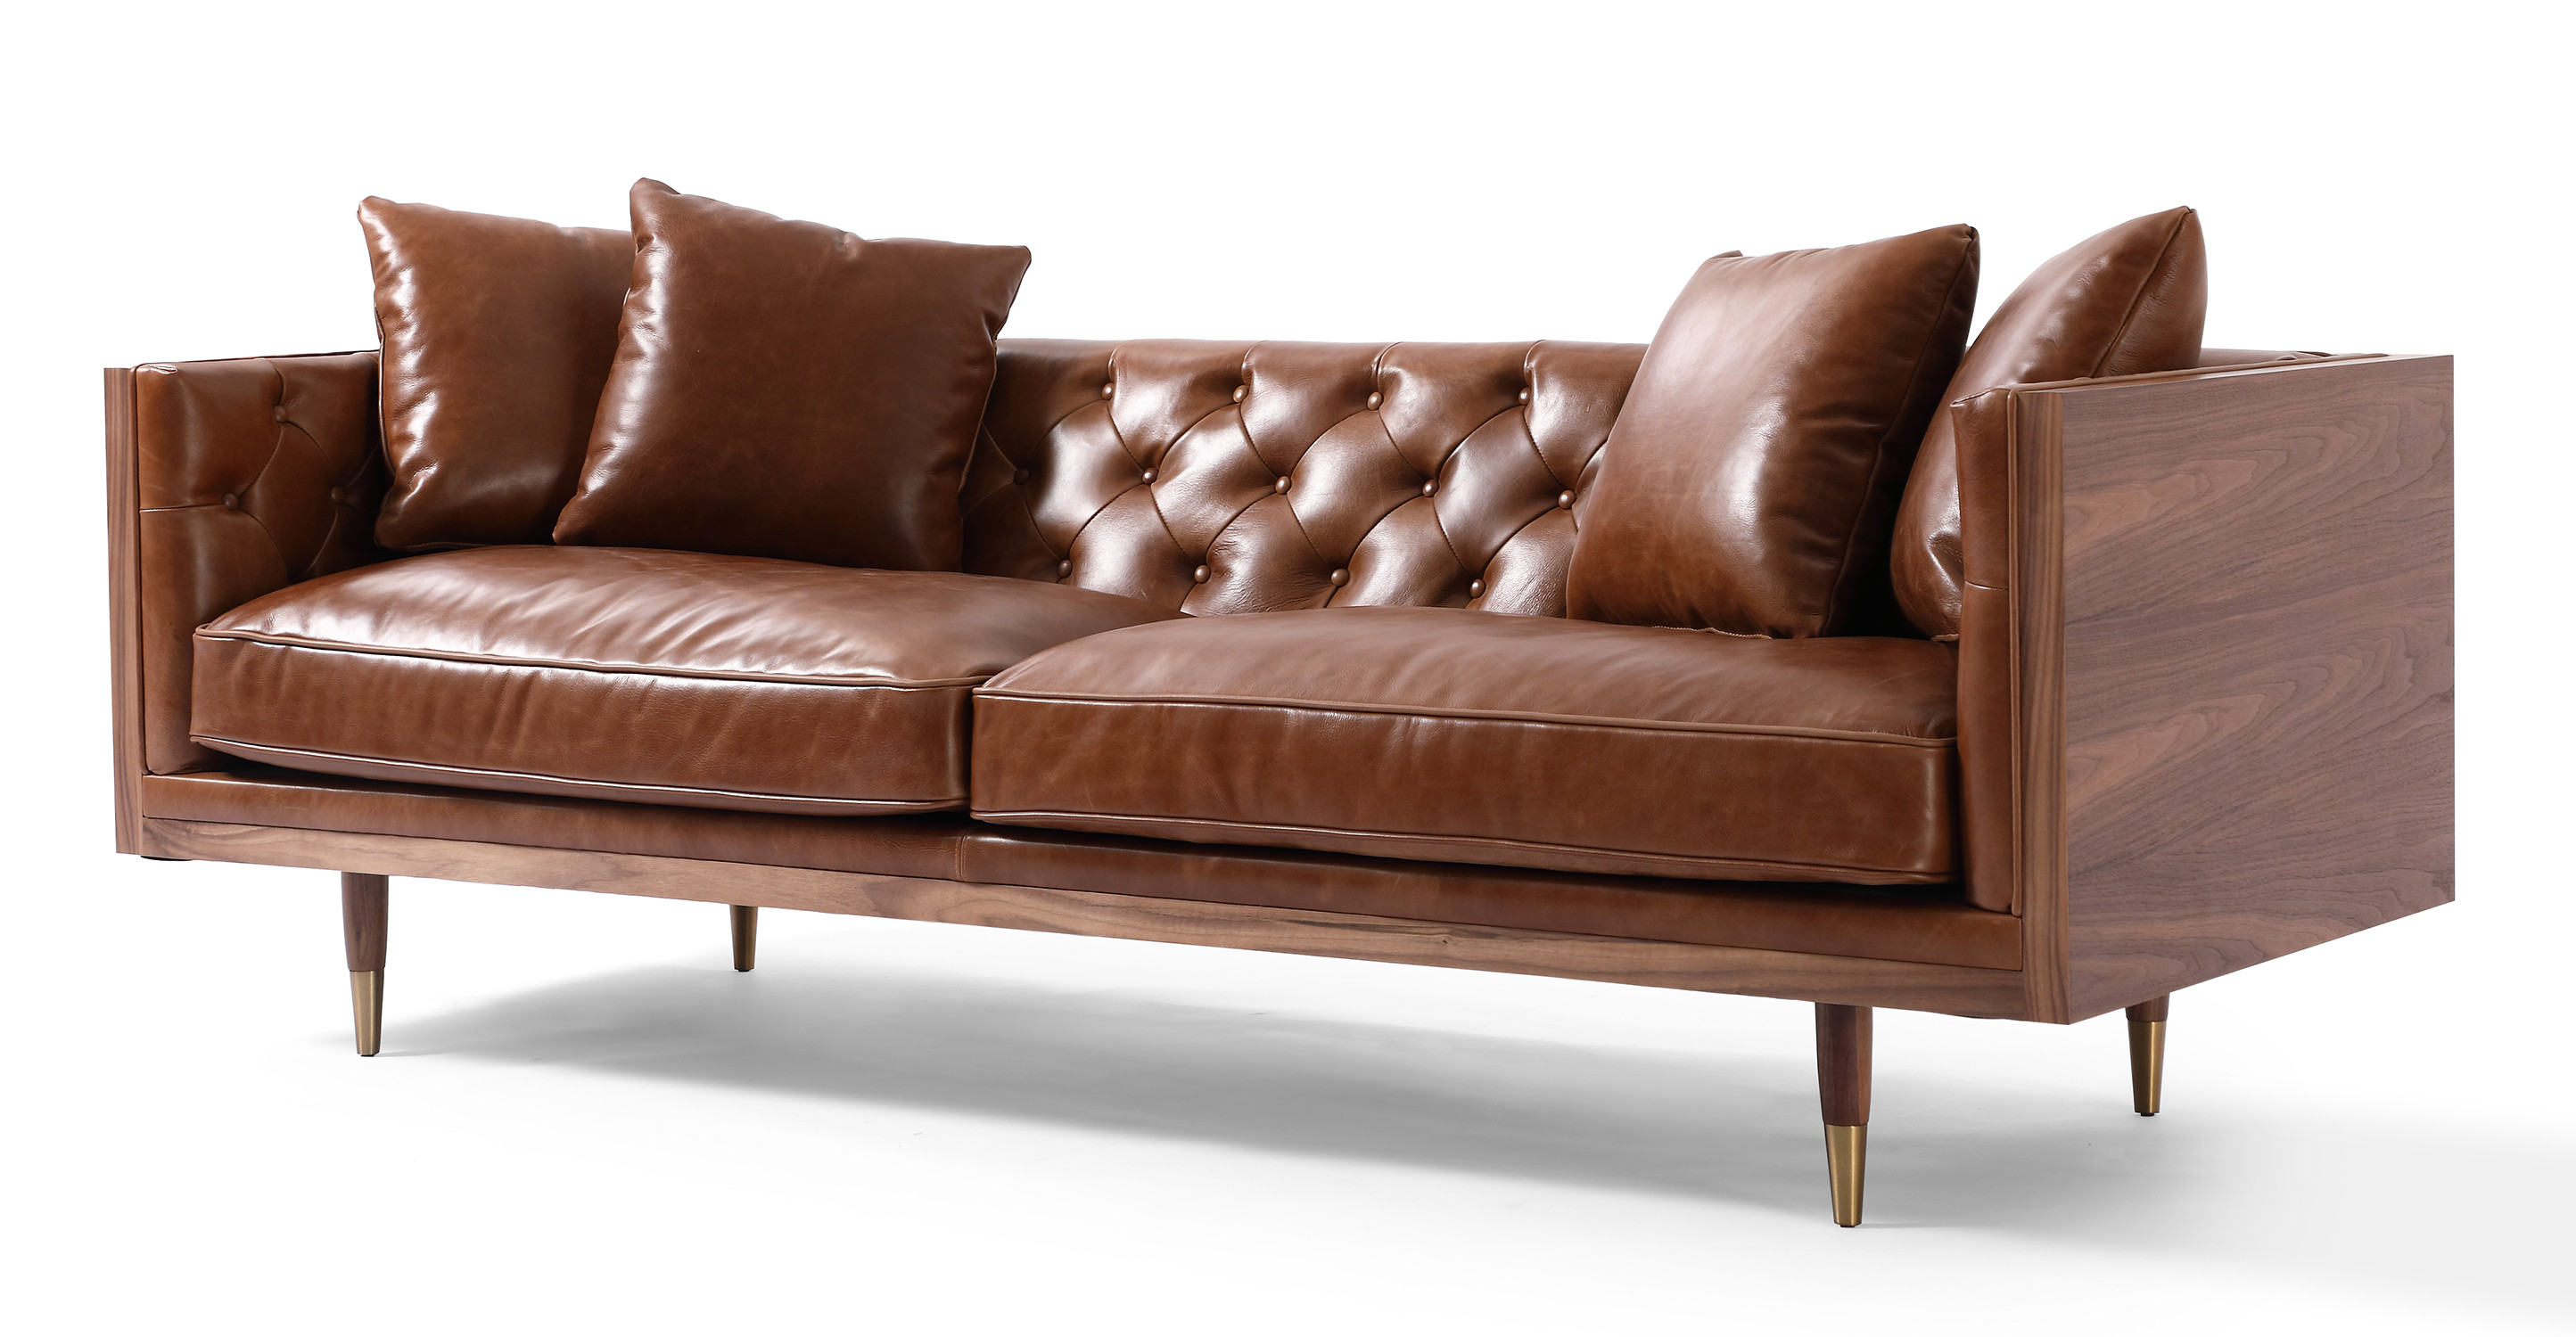 "Woodrow Neo 87"" Leather Sofa, Walnut/Saddle Brown"